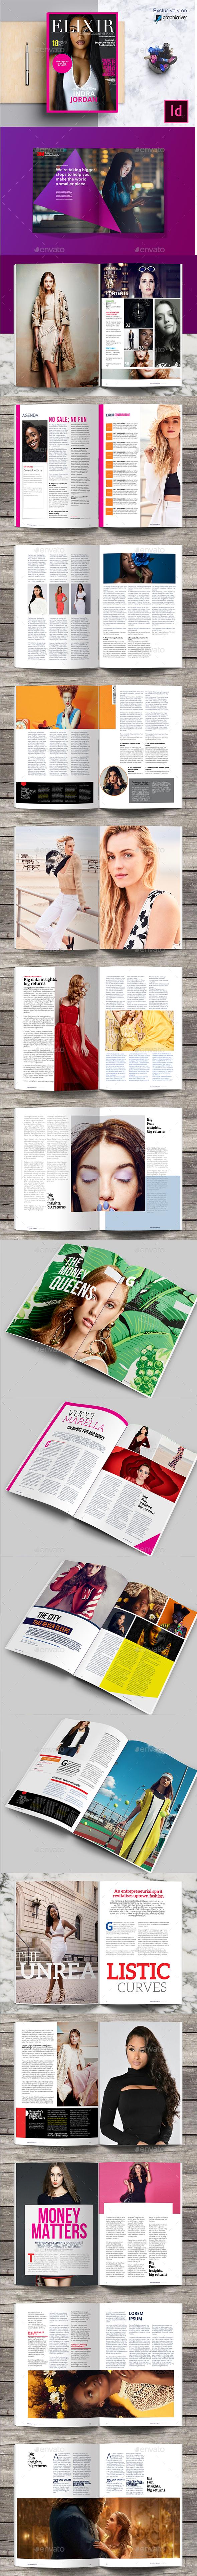 Elixir Fashion Magazine Indesign Template - Magazines Print Templates